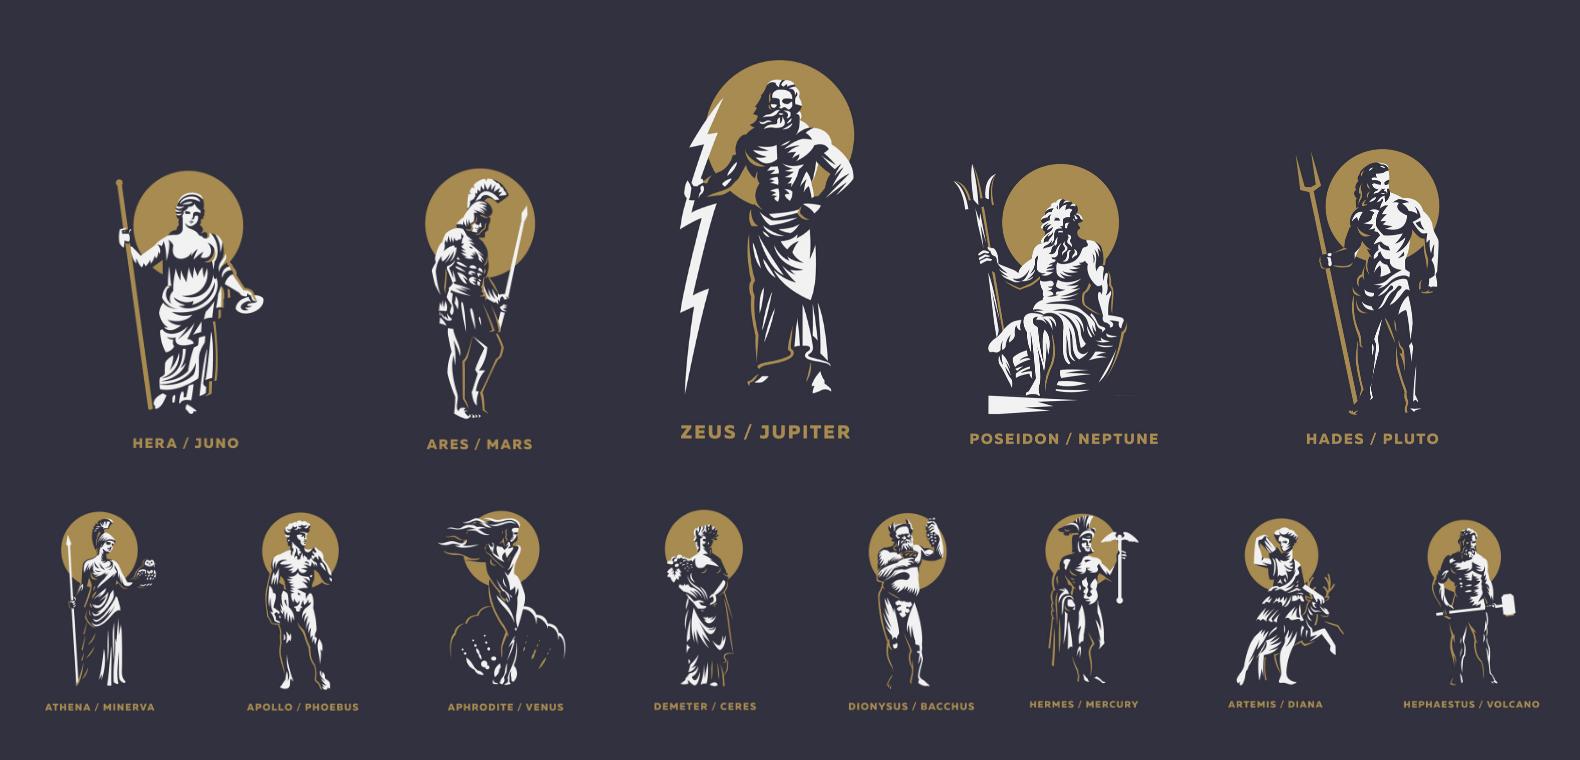 12 olympians in greek mythology